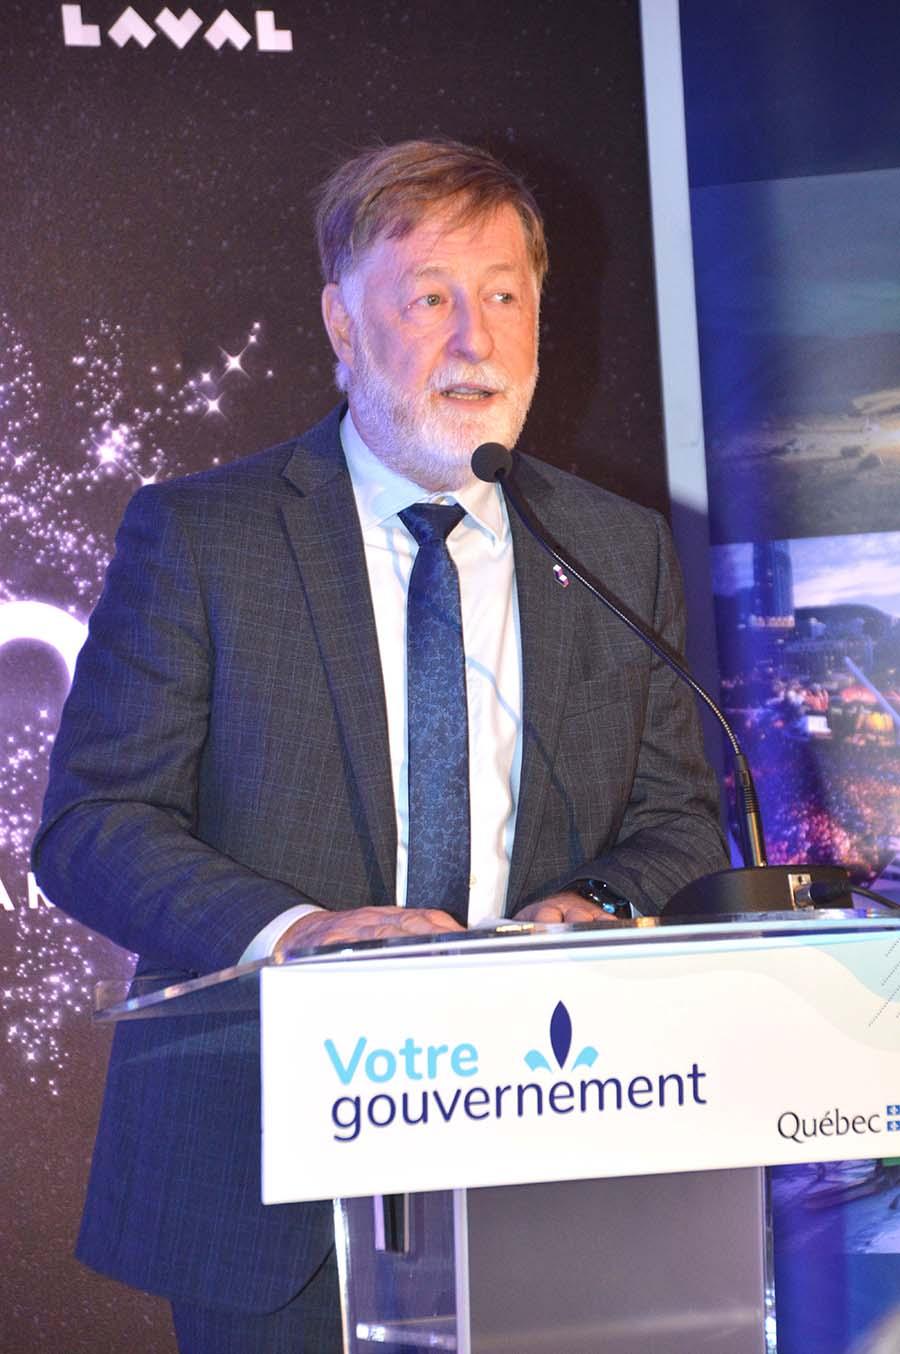 Quebec infrastructure legislation Bill 66 gets enthusiastic endorsement from Demers